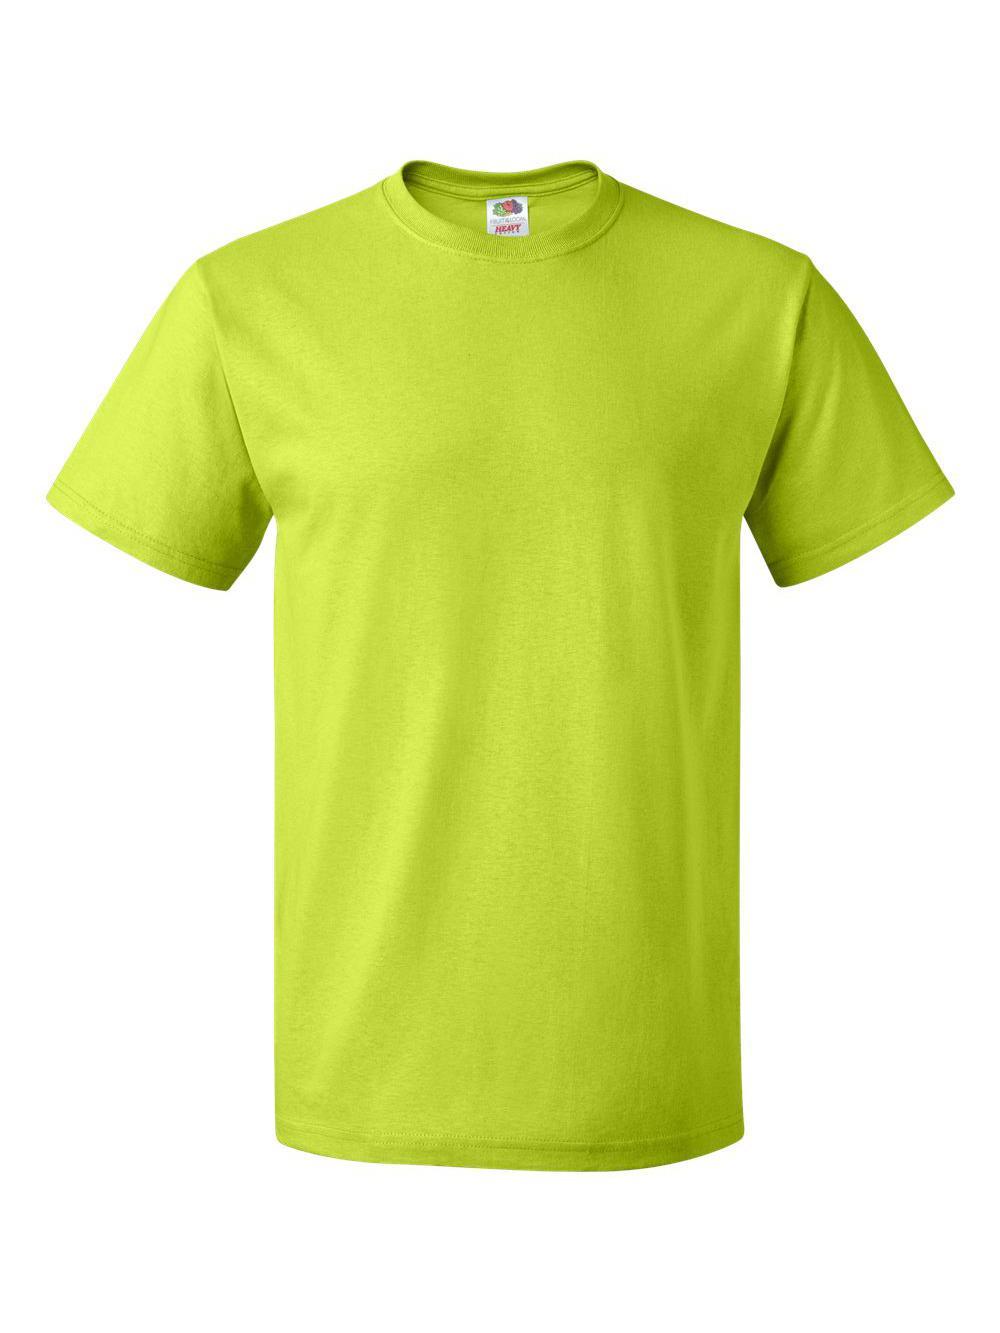 Fruit-of-the-Loom-HD-Cotton-Short-Sleeve-T-Shirt-3930R thumbnail 81